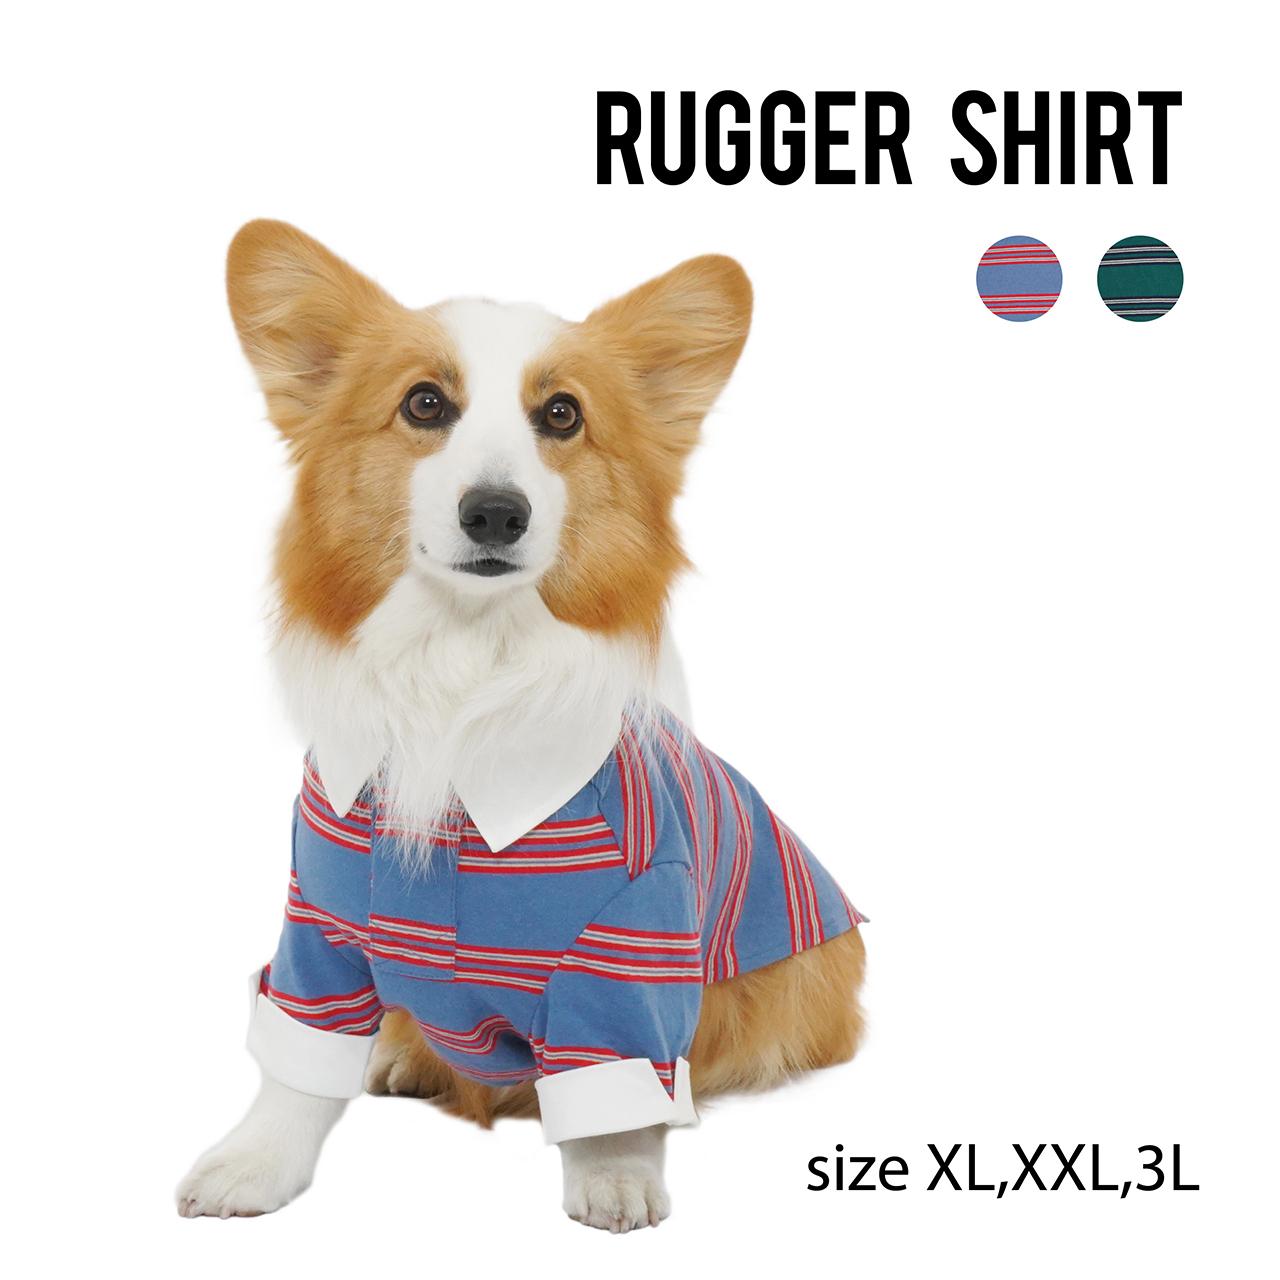 RUGGER SHIRT(XL,XXL,3L) ラガーシャツ